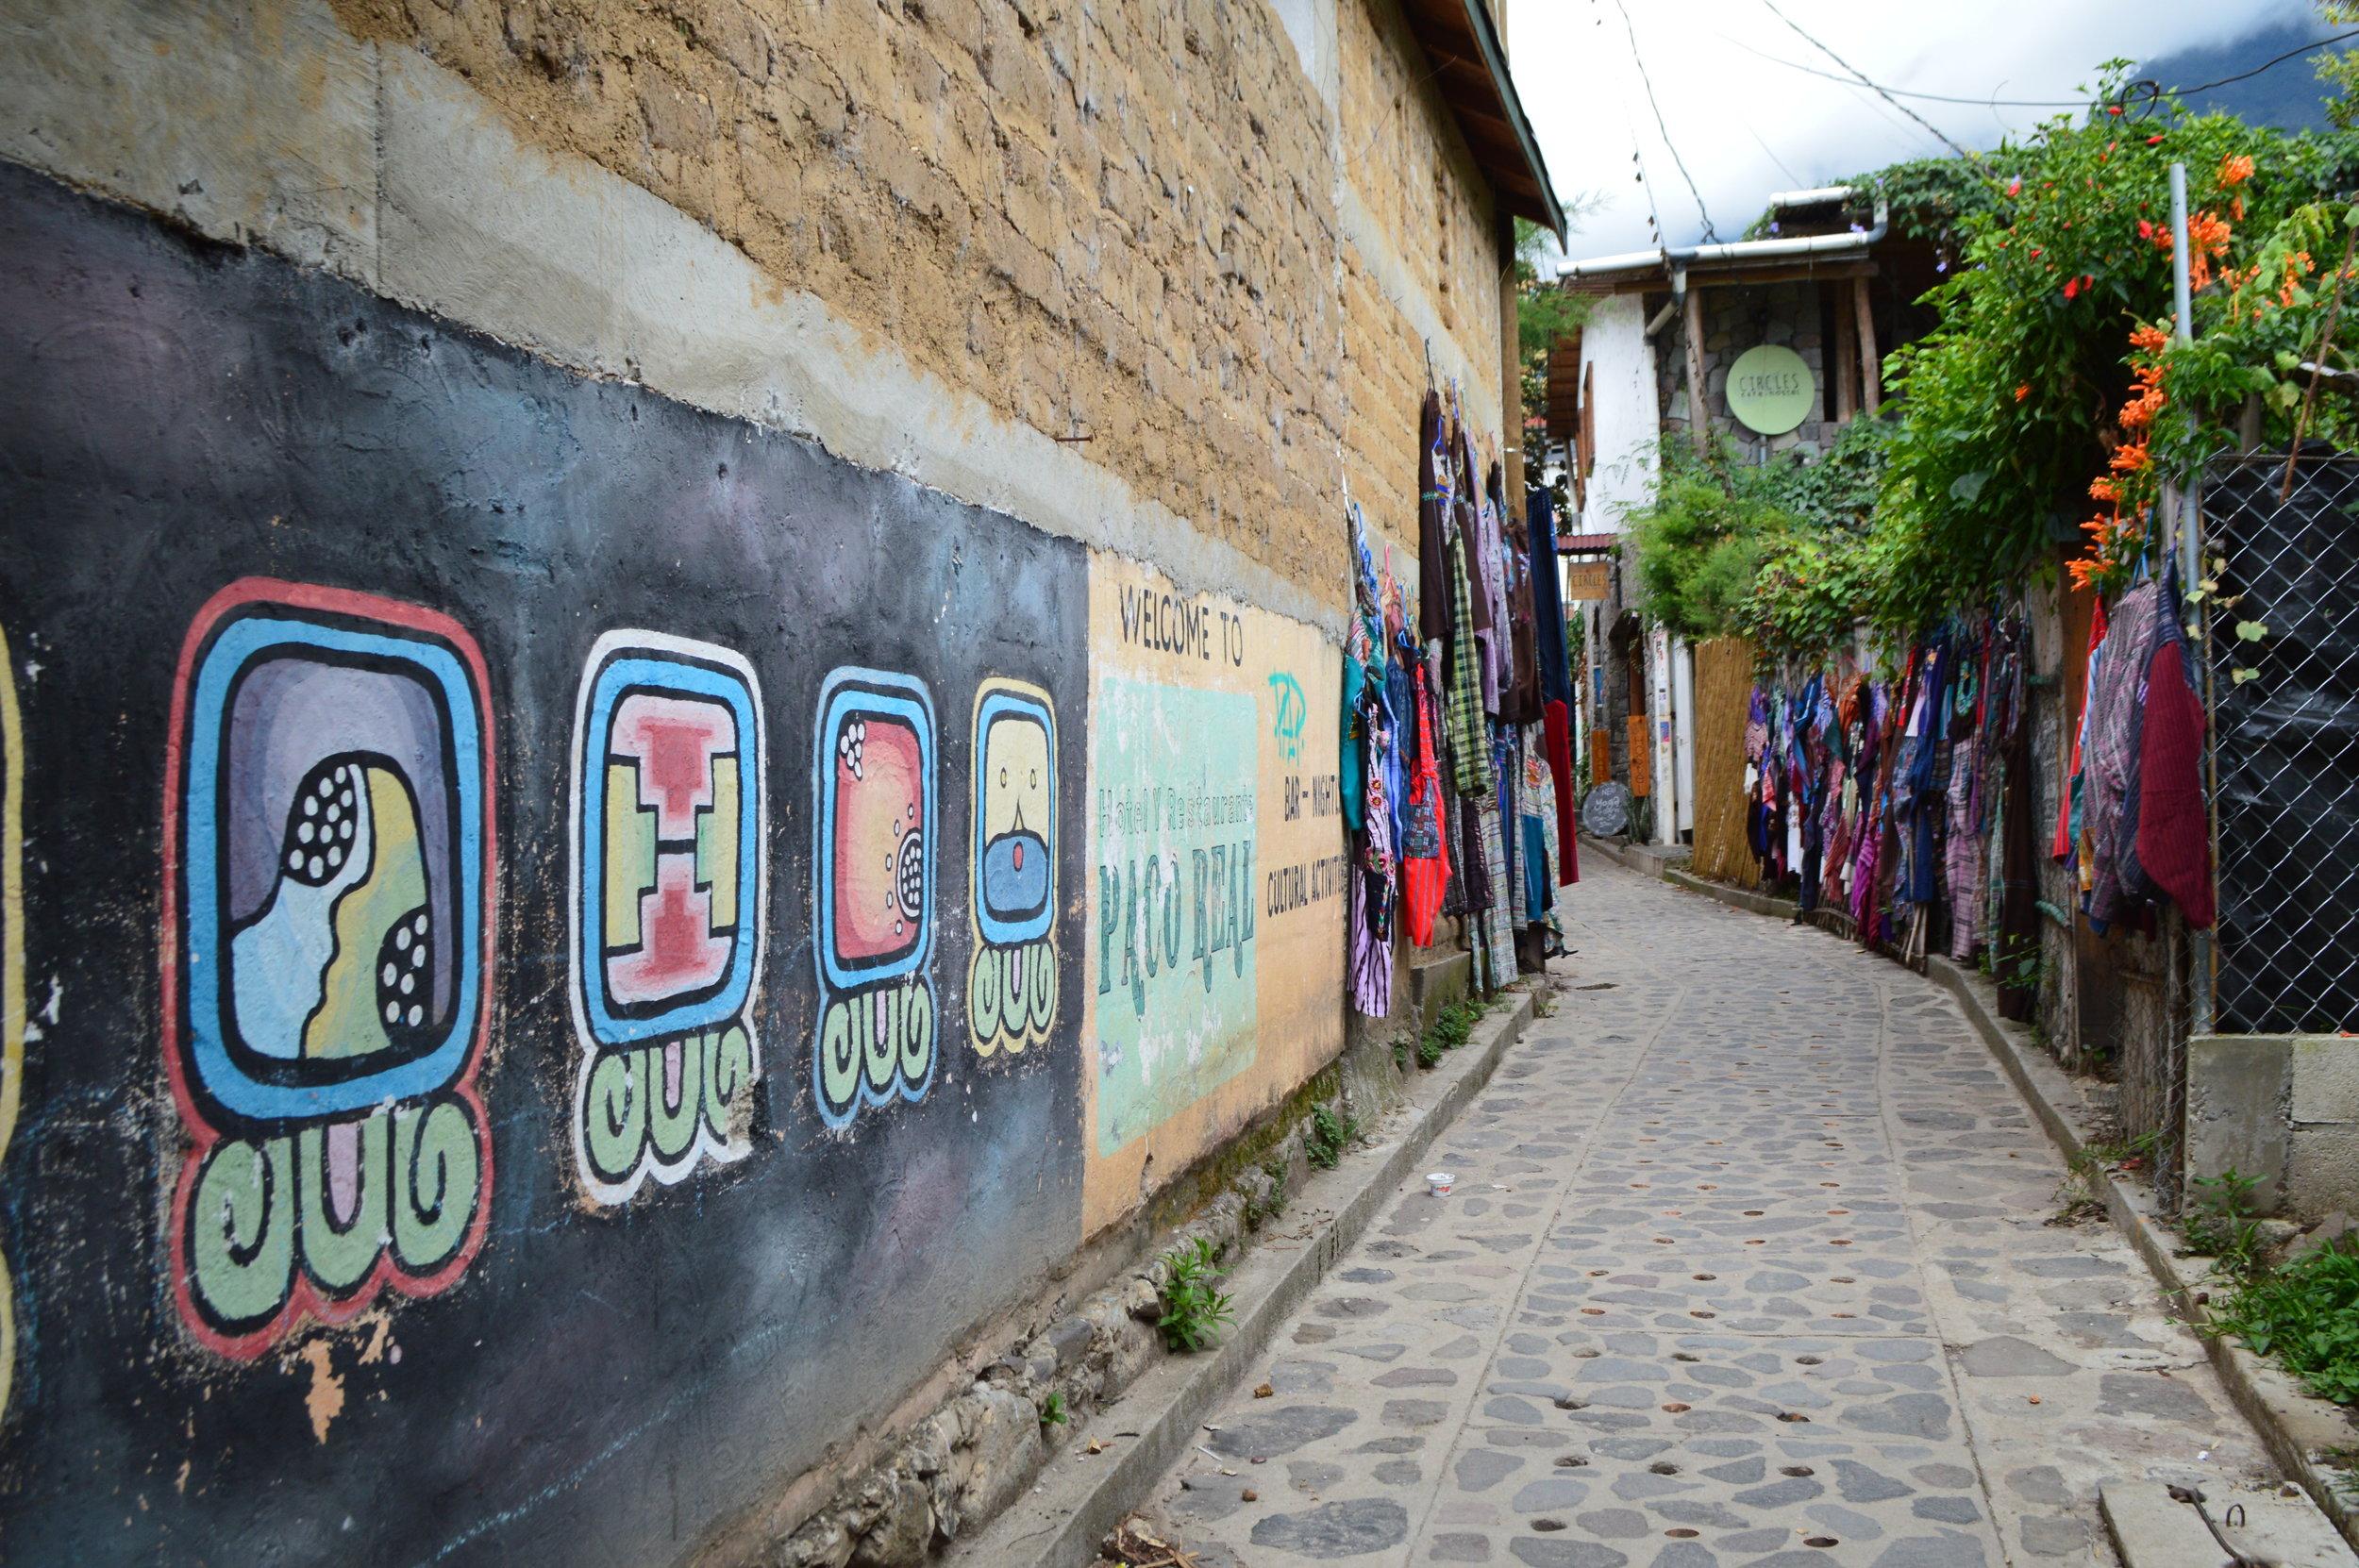 Beautiful murals along the path